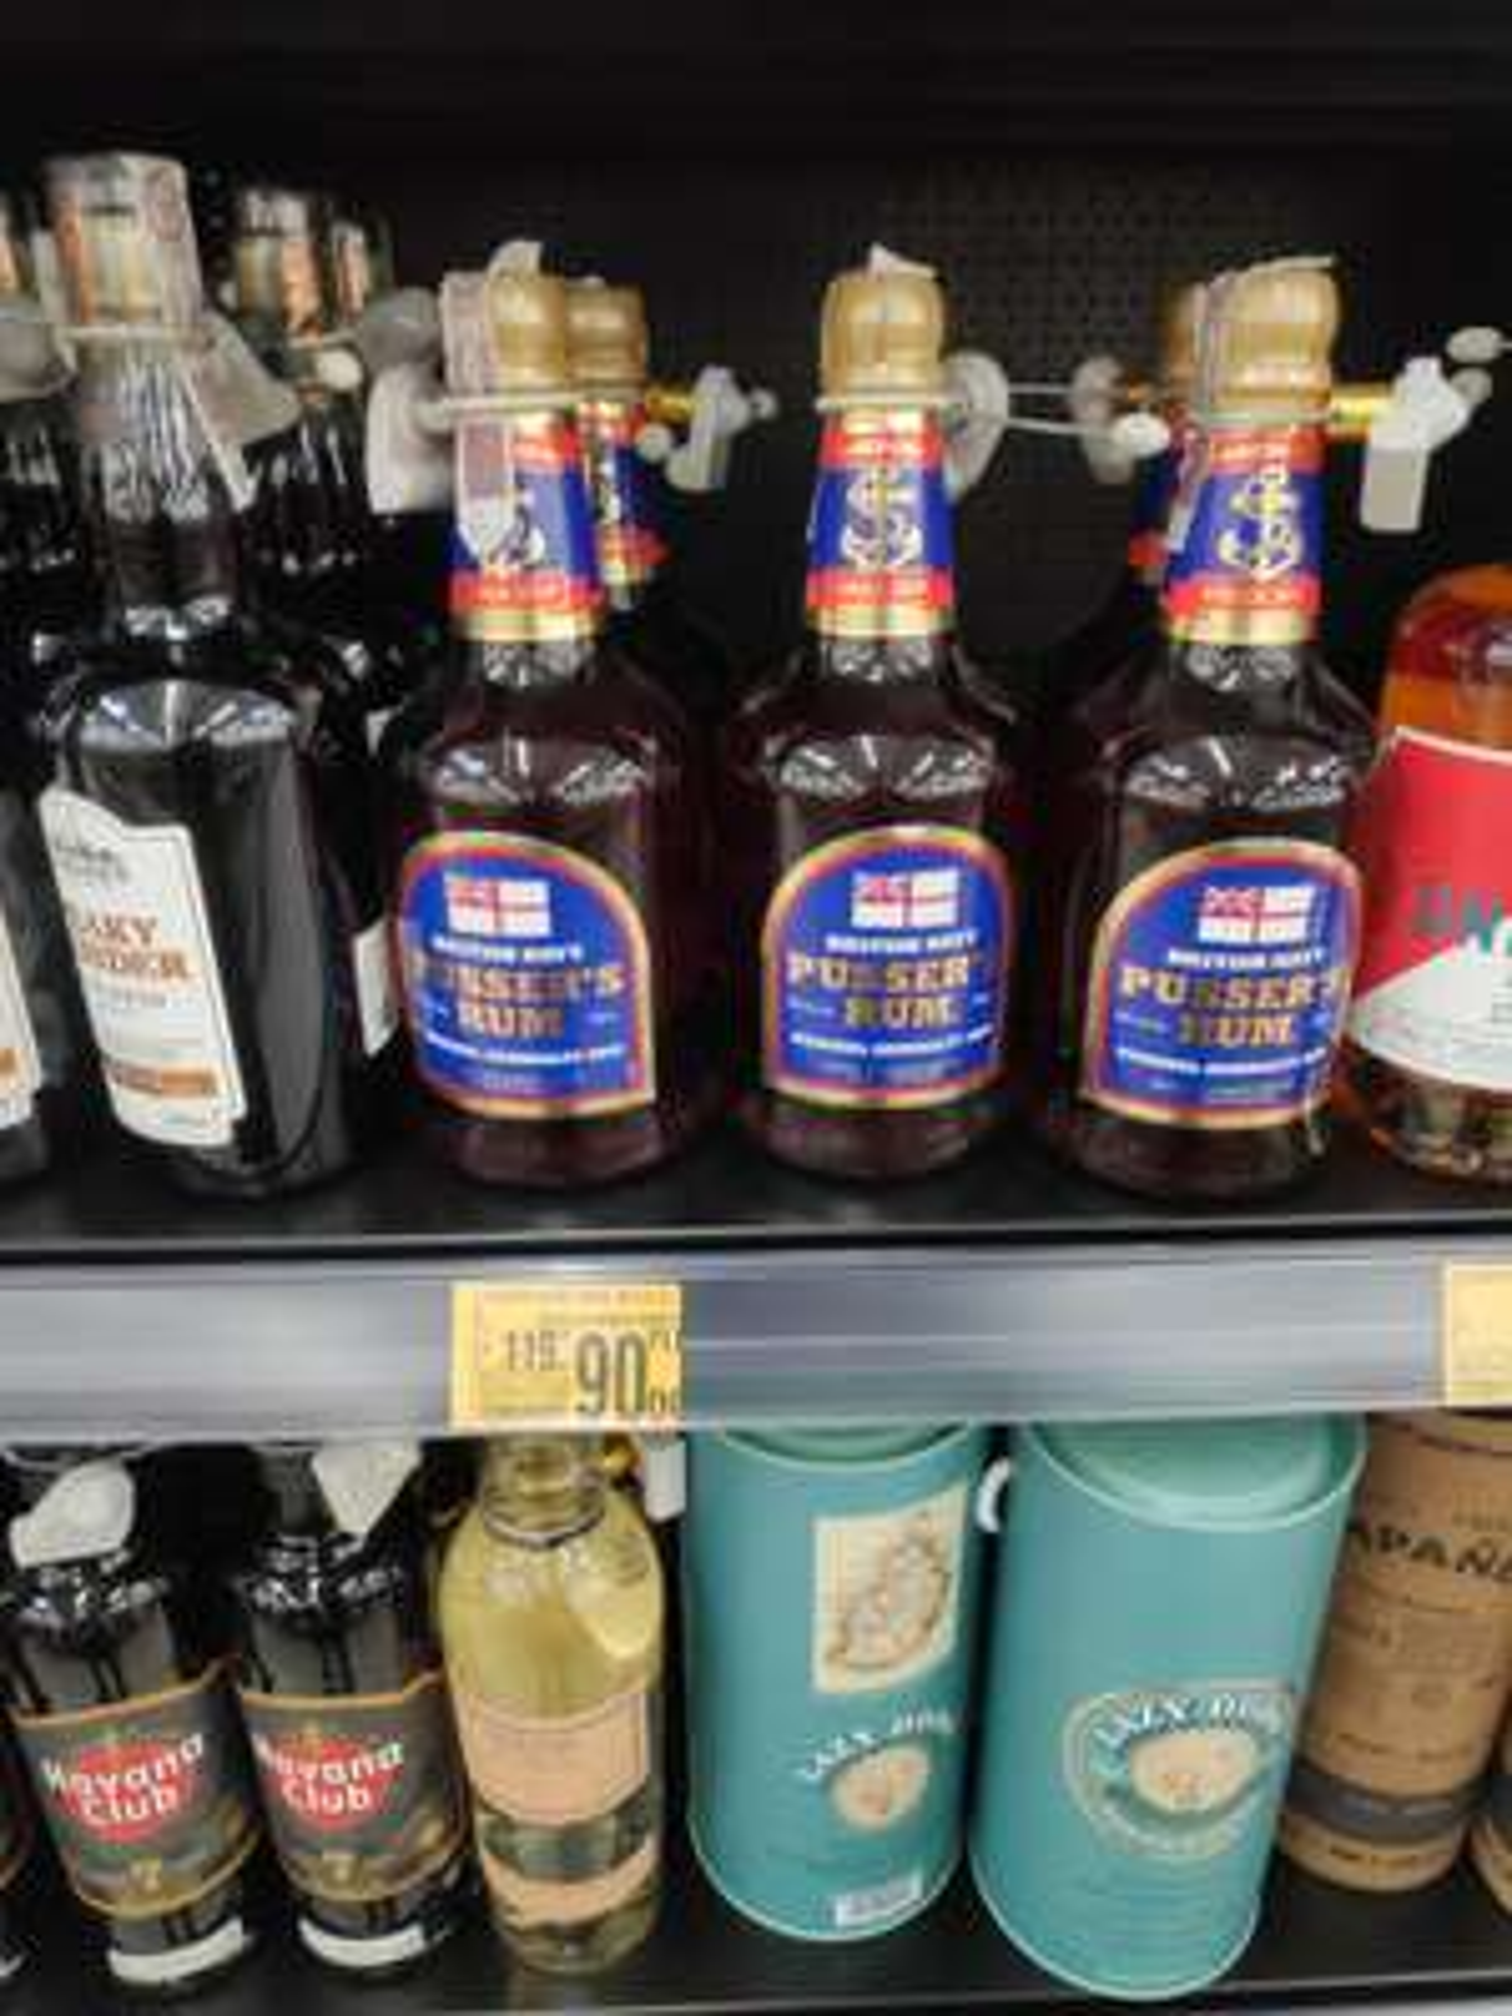 Rum pusser's blue label Auchan